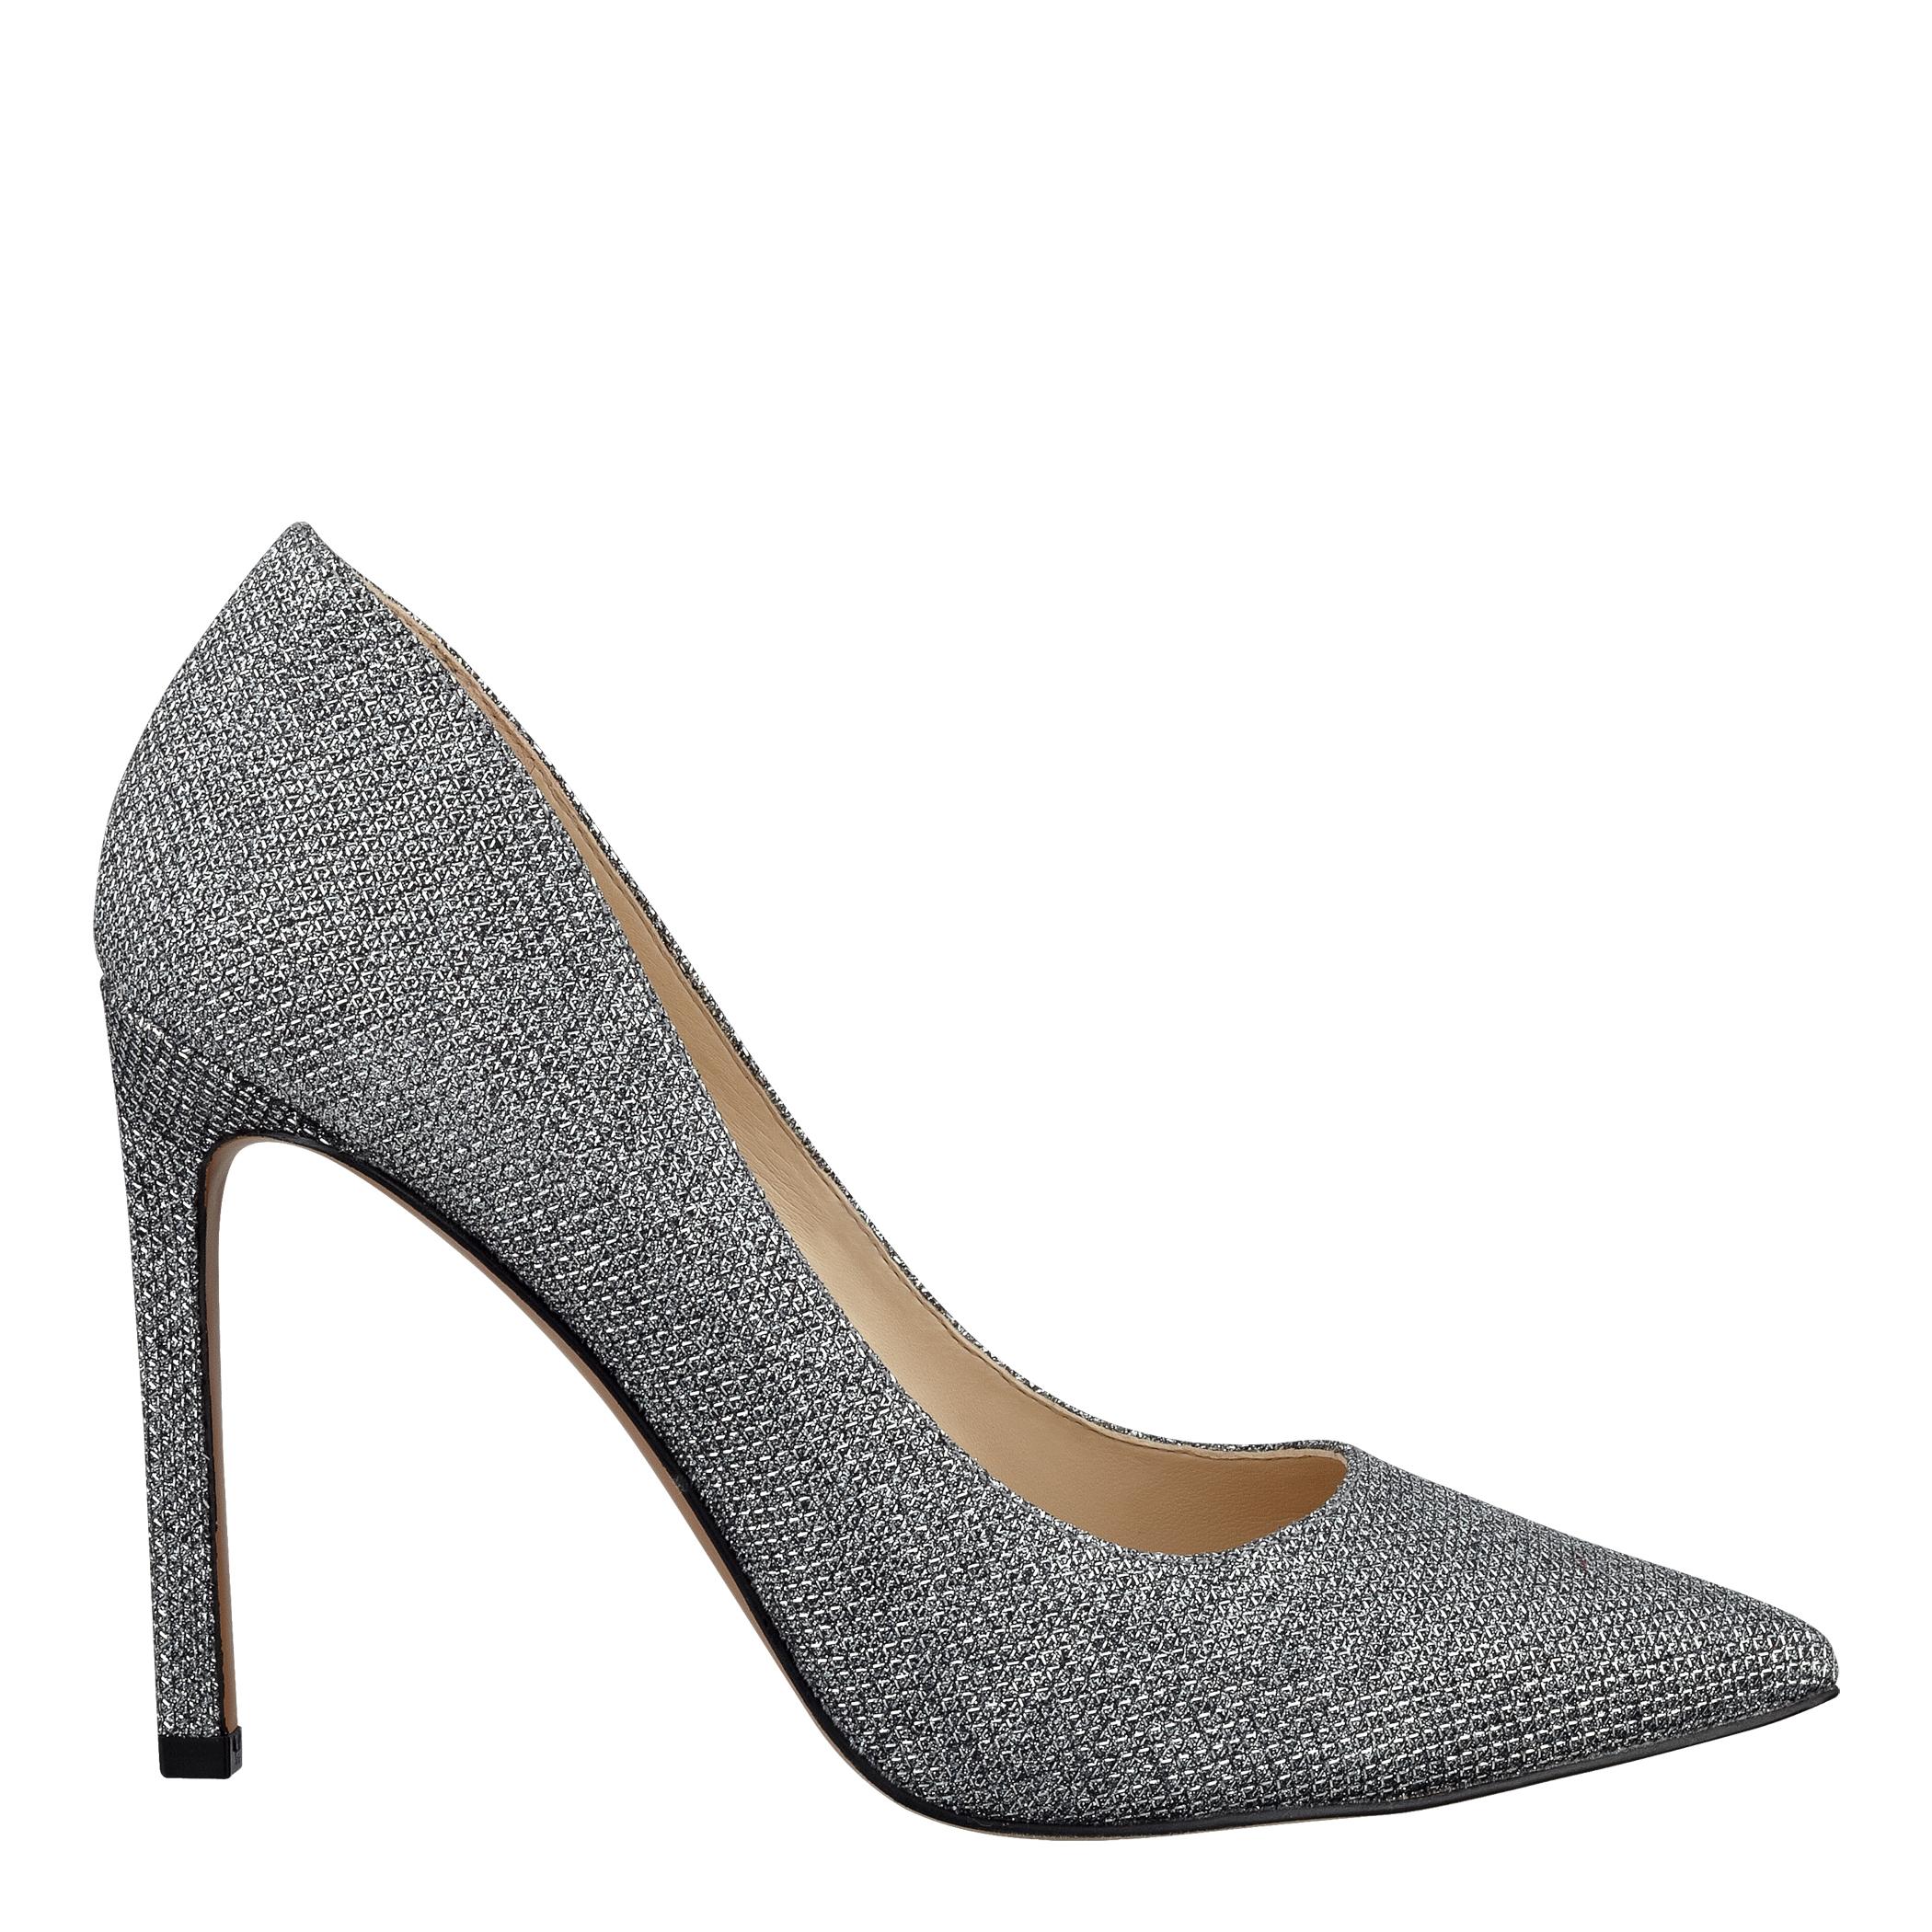 Lyst Nine West Tatiana Pointed Toe Pumps In Metallic. Shoe Nine West Pewter  Charly2 Heel Court Women